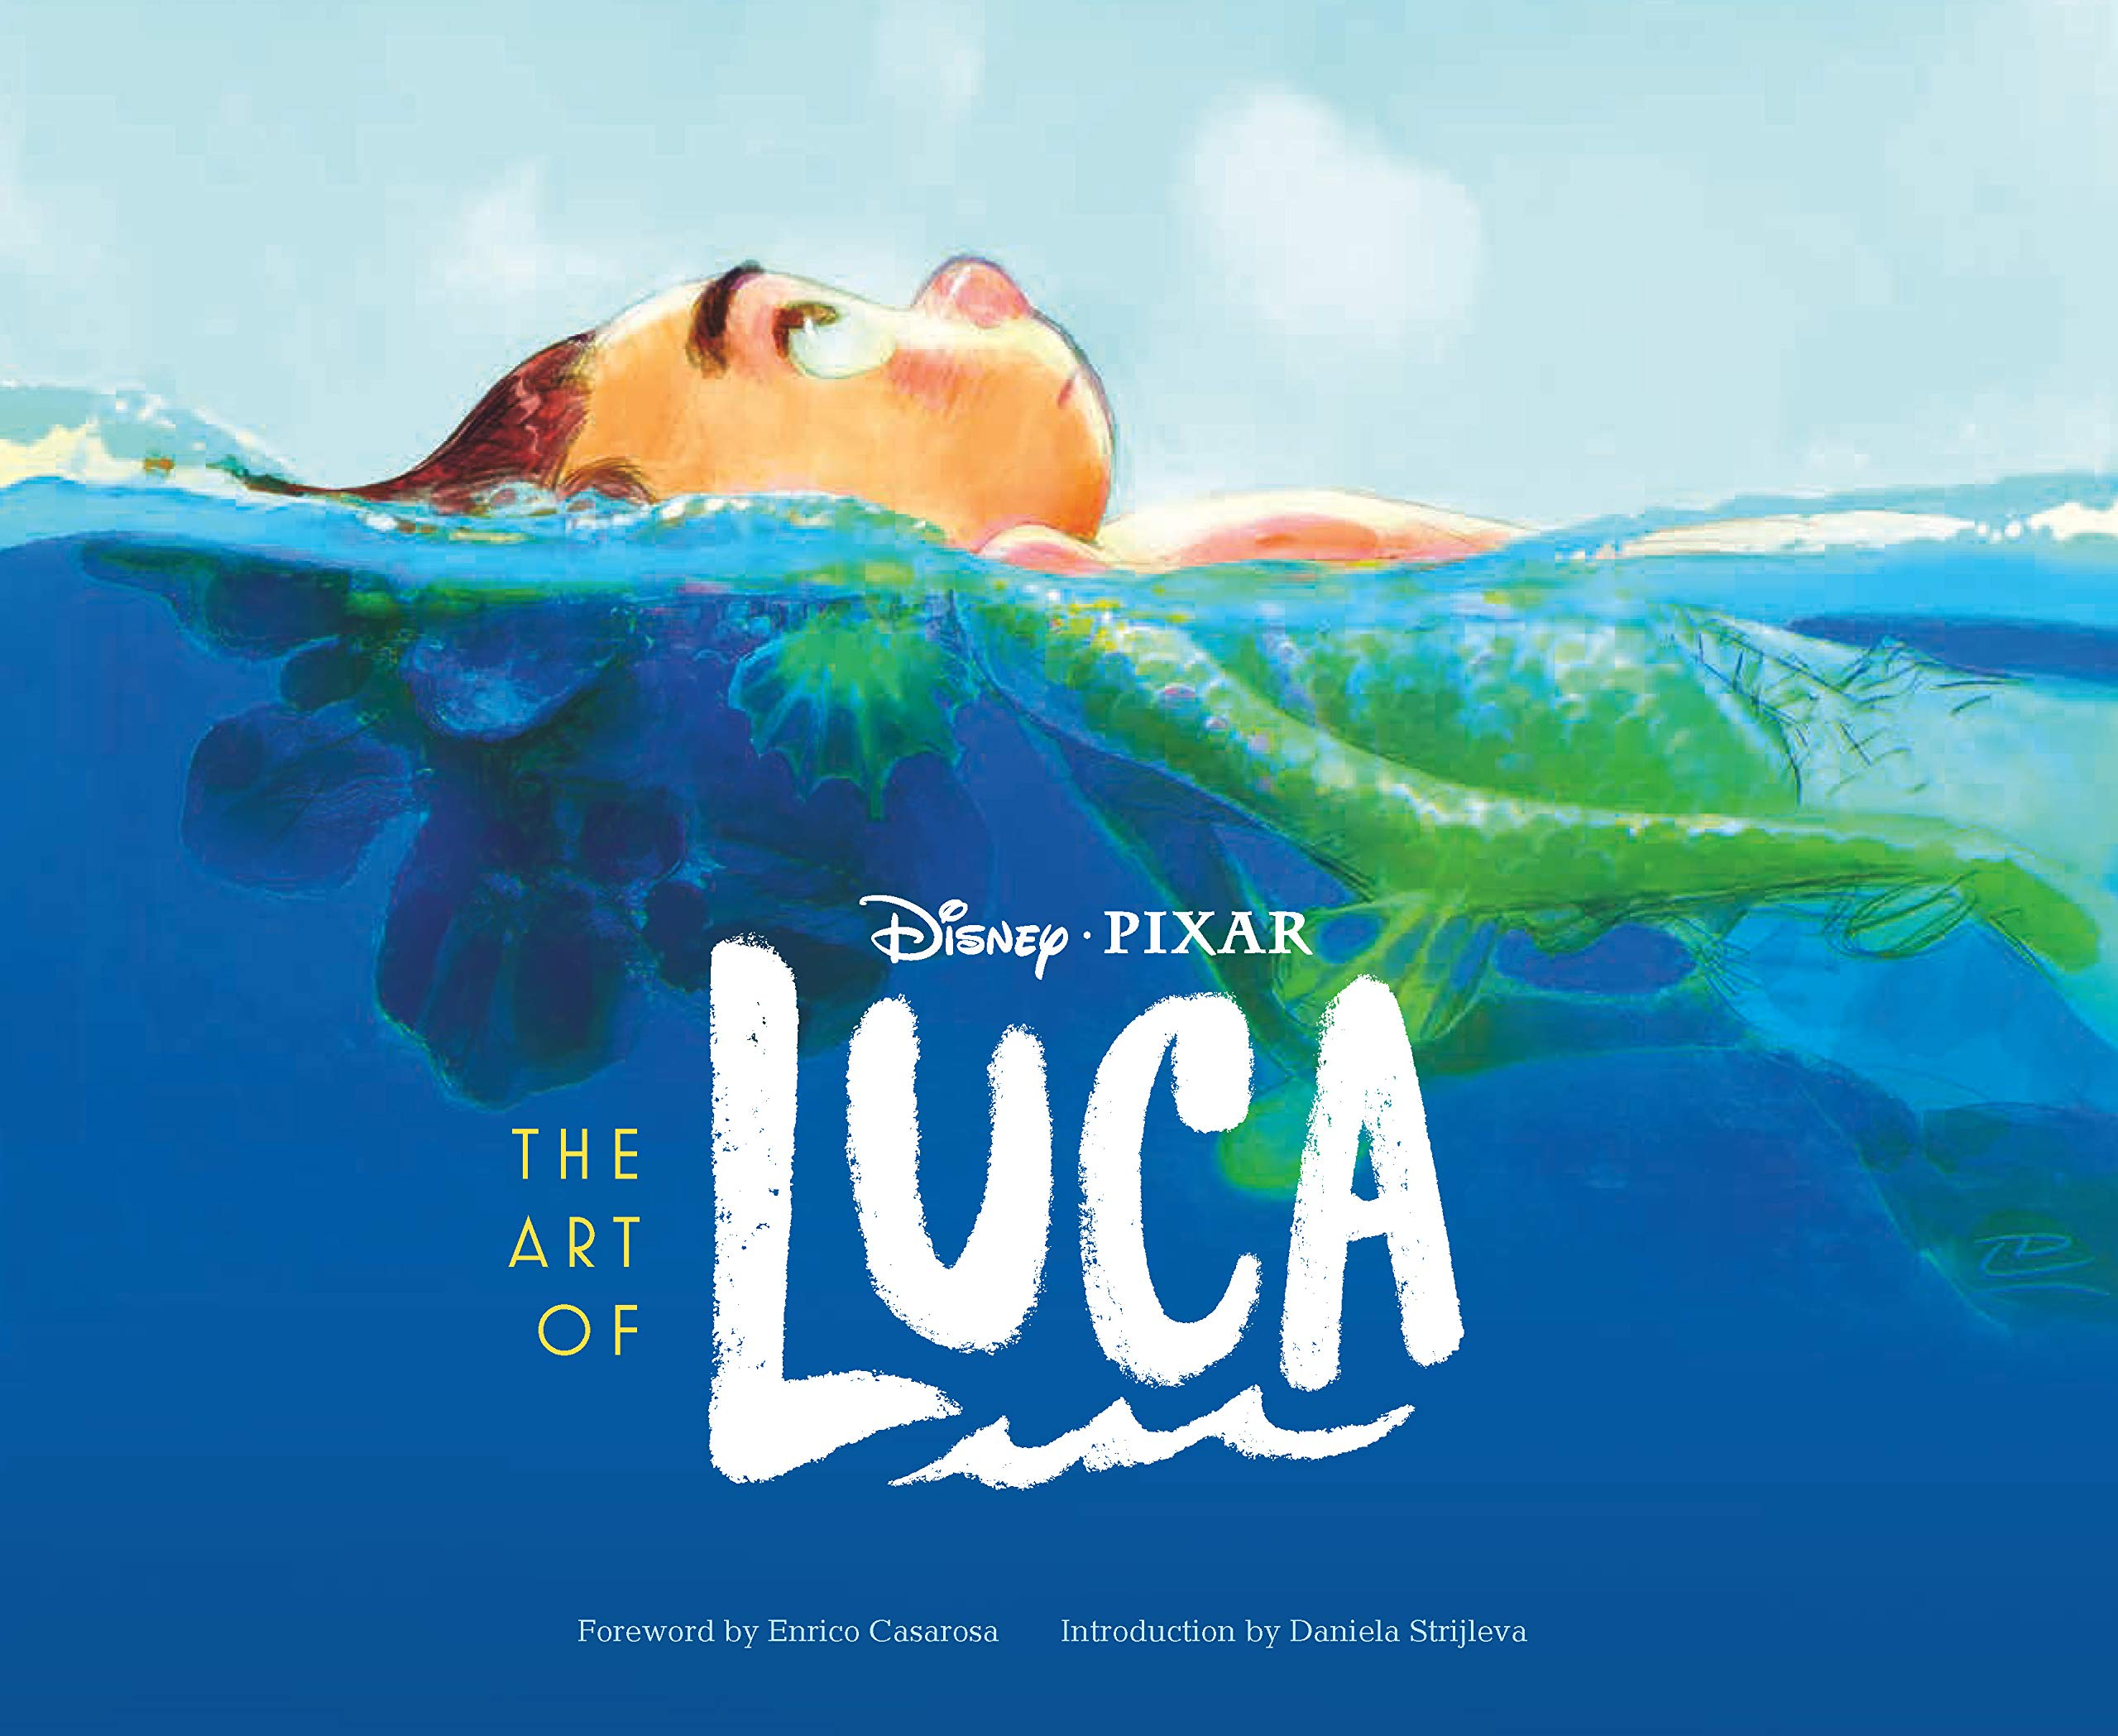 Amazon.com: The Art of Luca (9781797207254): Strijleva, Daniela, Casarosa, Enrico: Books